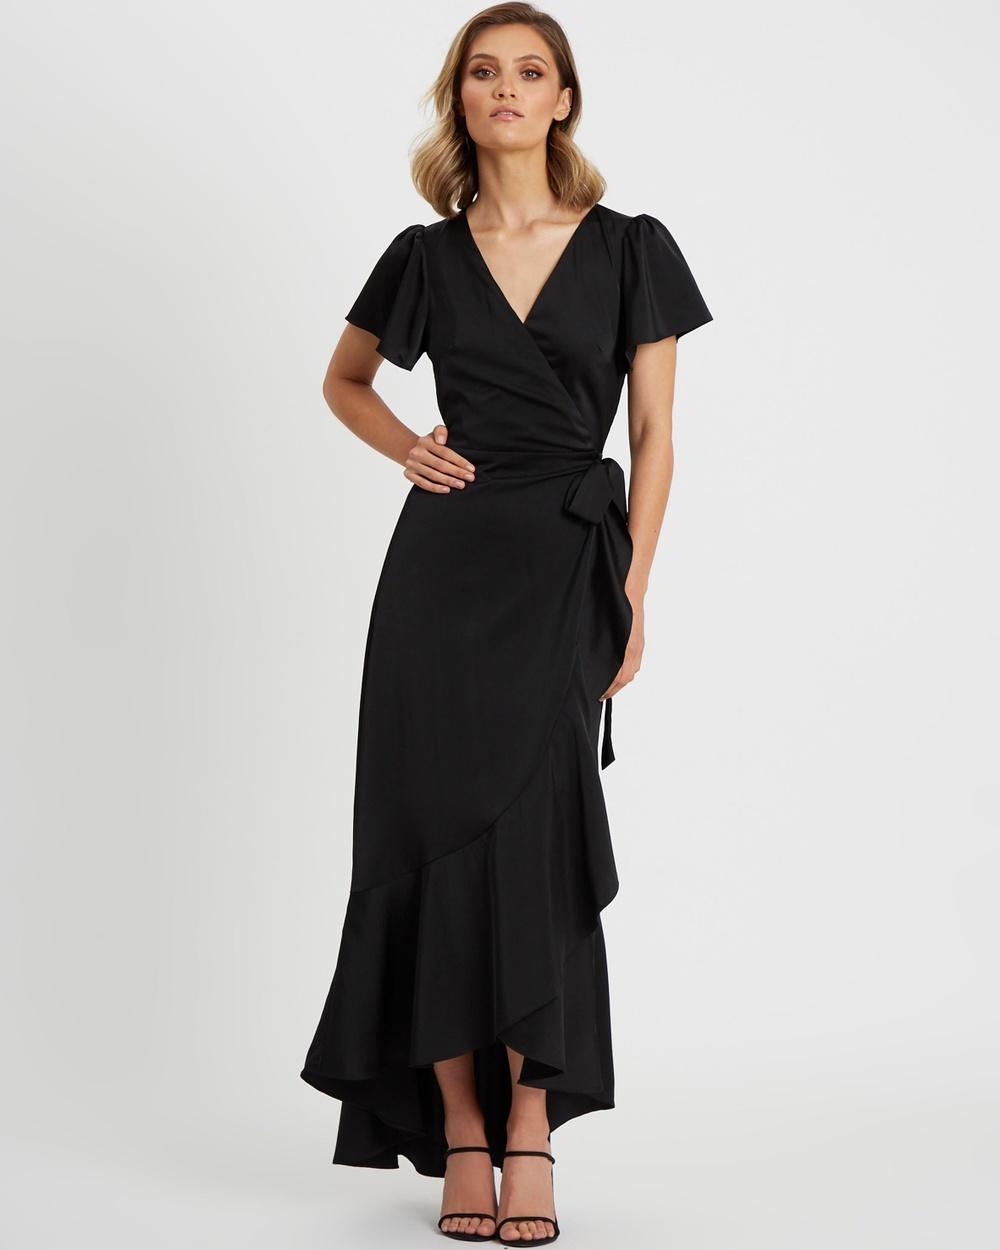 CHANCERY Jonas Wrap Dress Bridesmaid Dresses Black